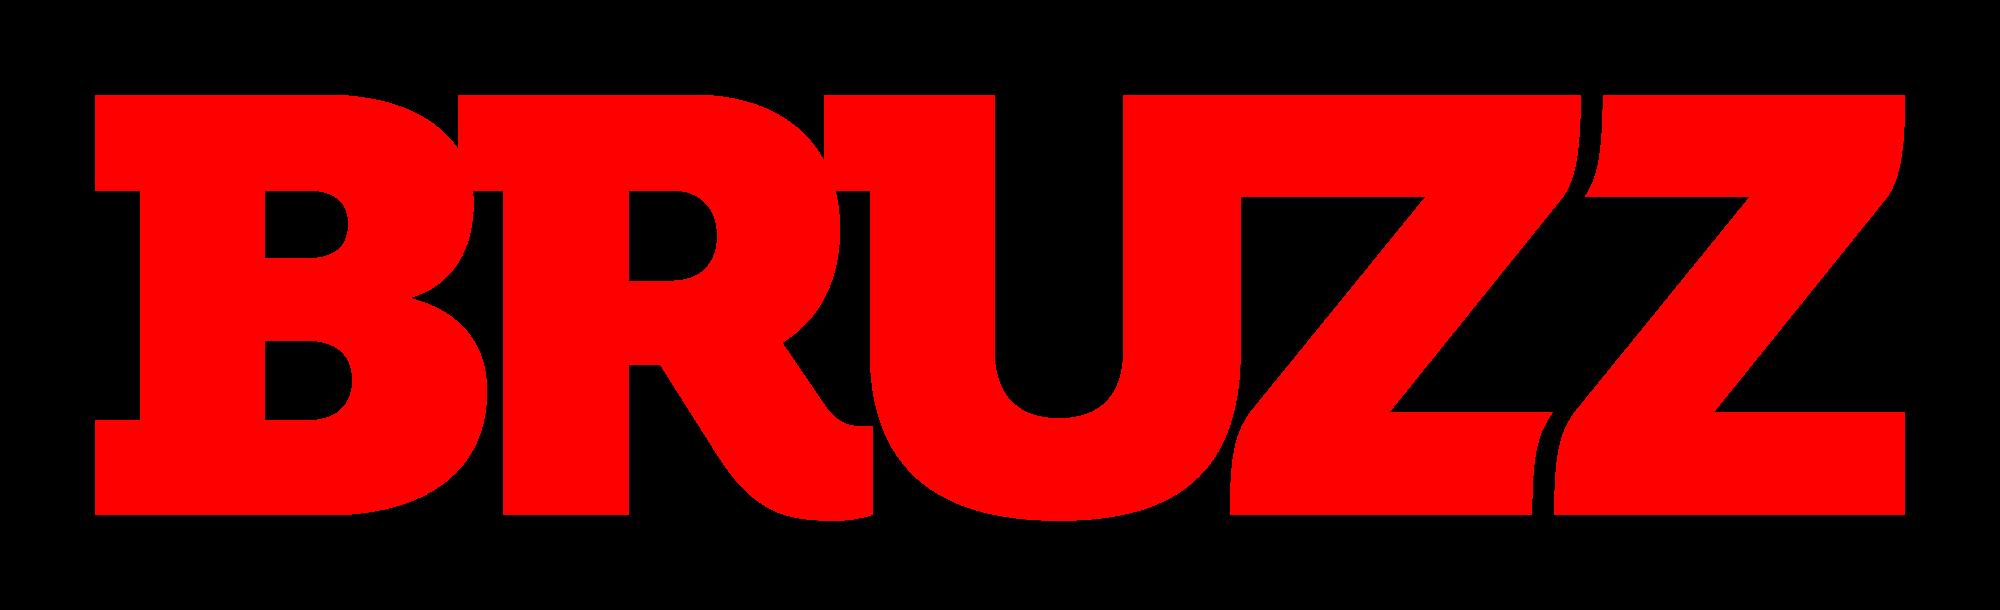 BRUZZ_LOGO_RED_RGB_BIG.png